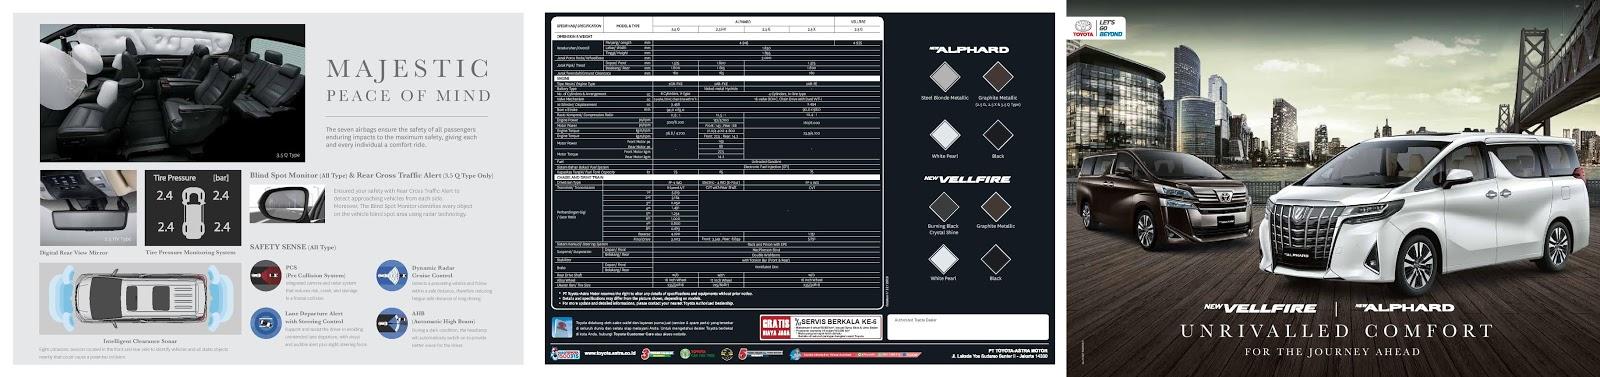 Toyota Alphard Pekanbaru